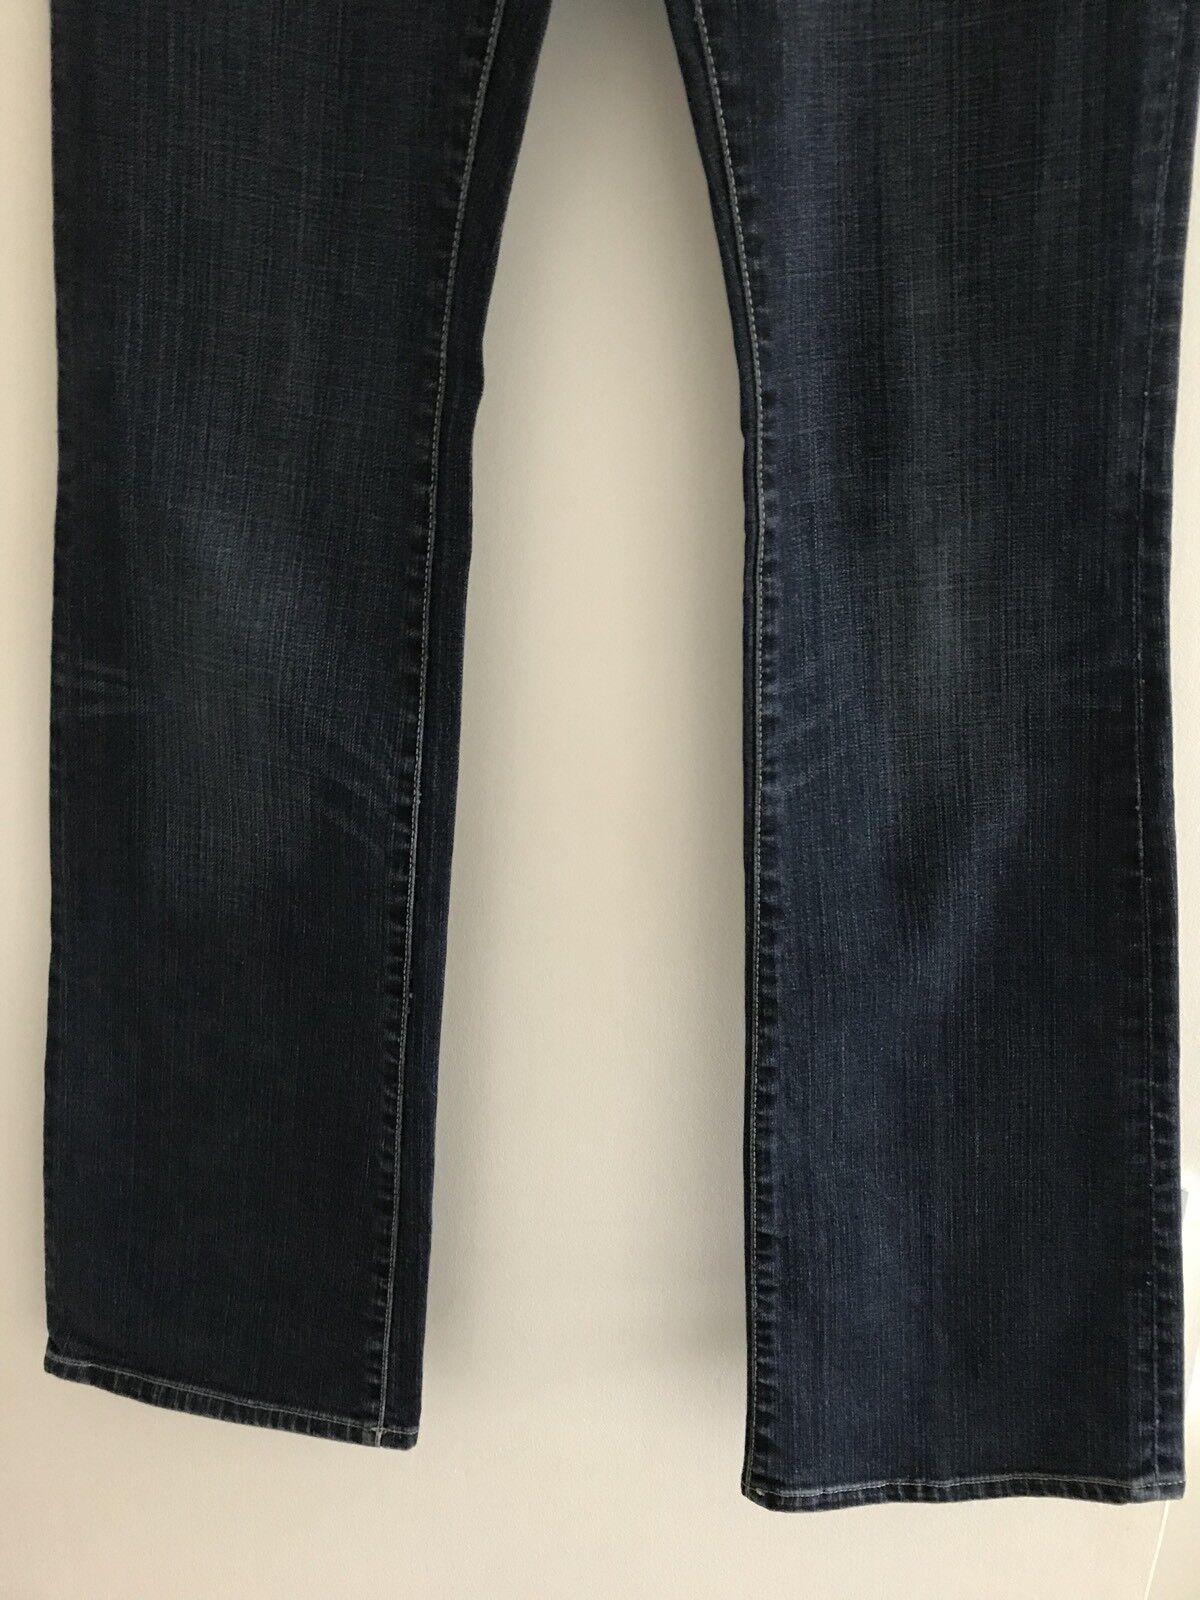 Donna Dritto 5 avviocut Gap Gap Gap tasche blu denim jeans-Taglia US 4 R 2f7b5a